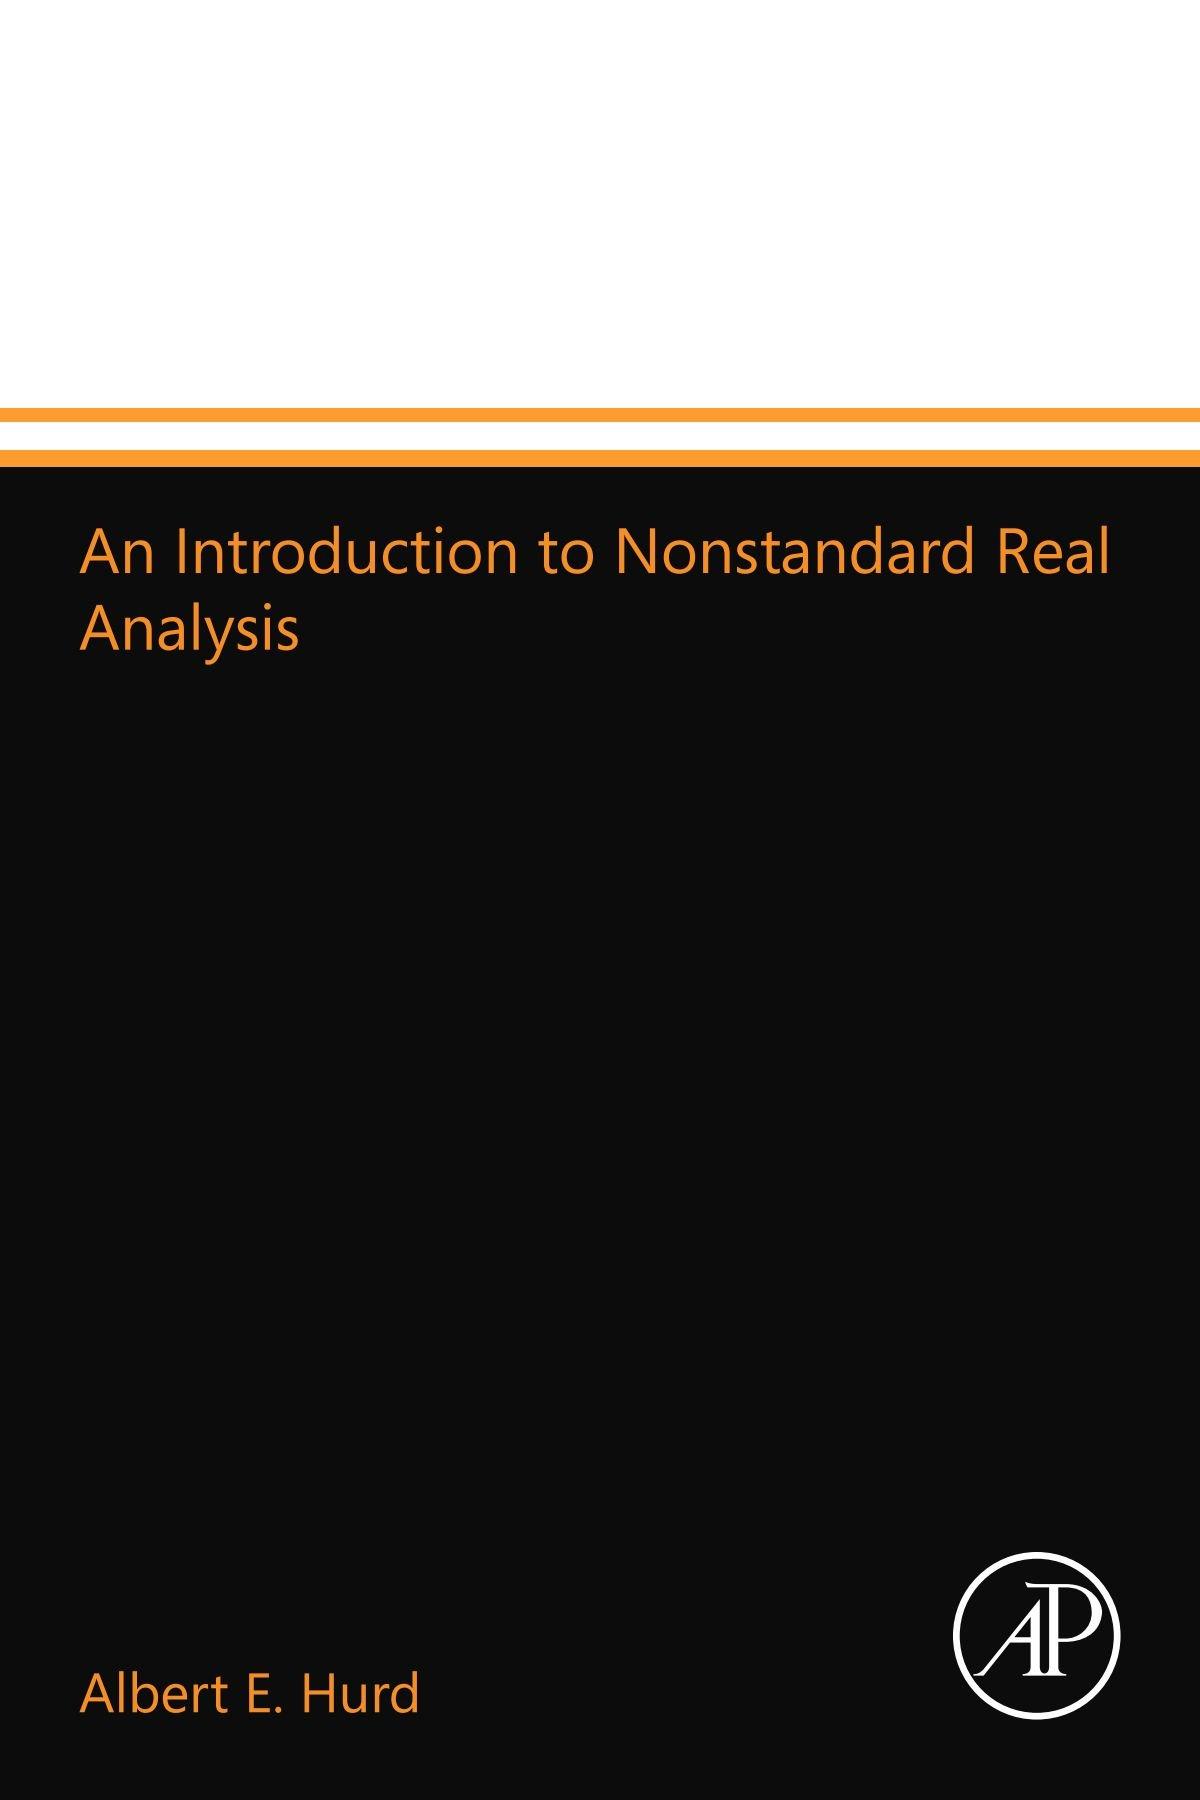 An Introduction to Nonstandard Real Analysis: Albert E  Hurd